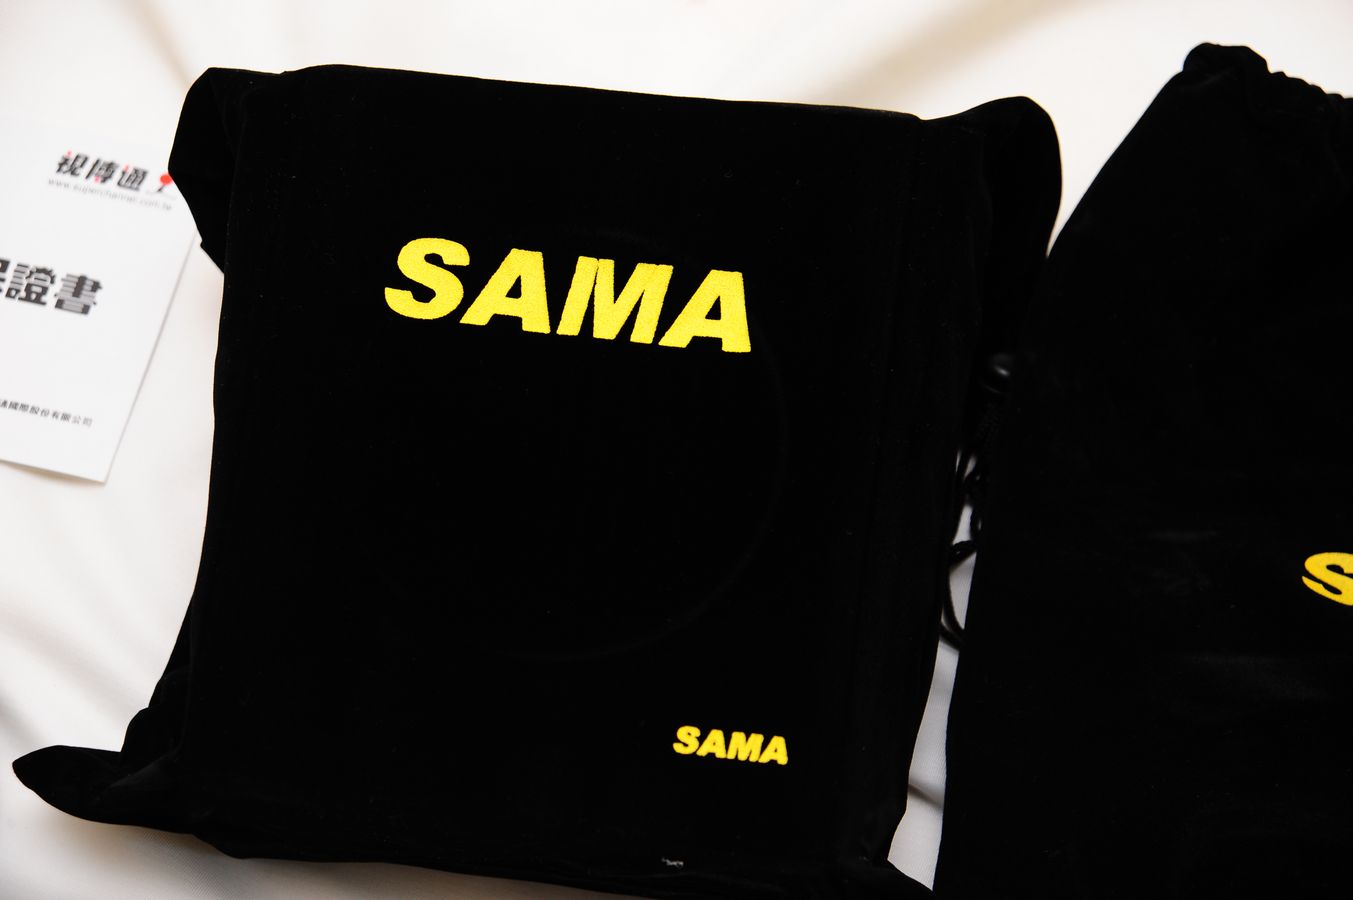 samaarm750w_04.JPG